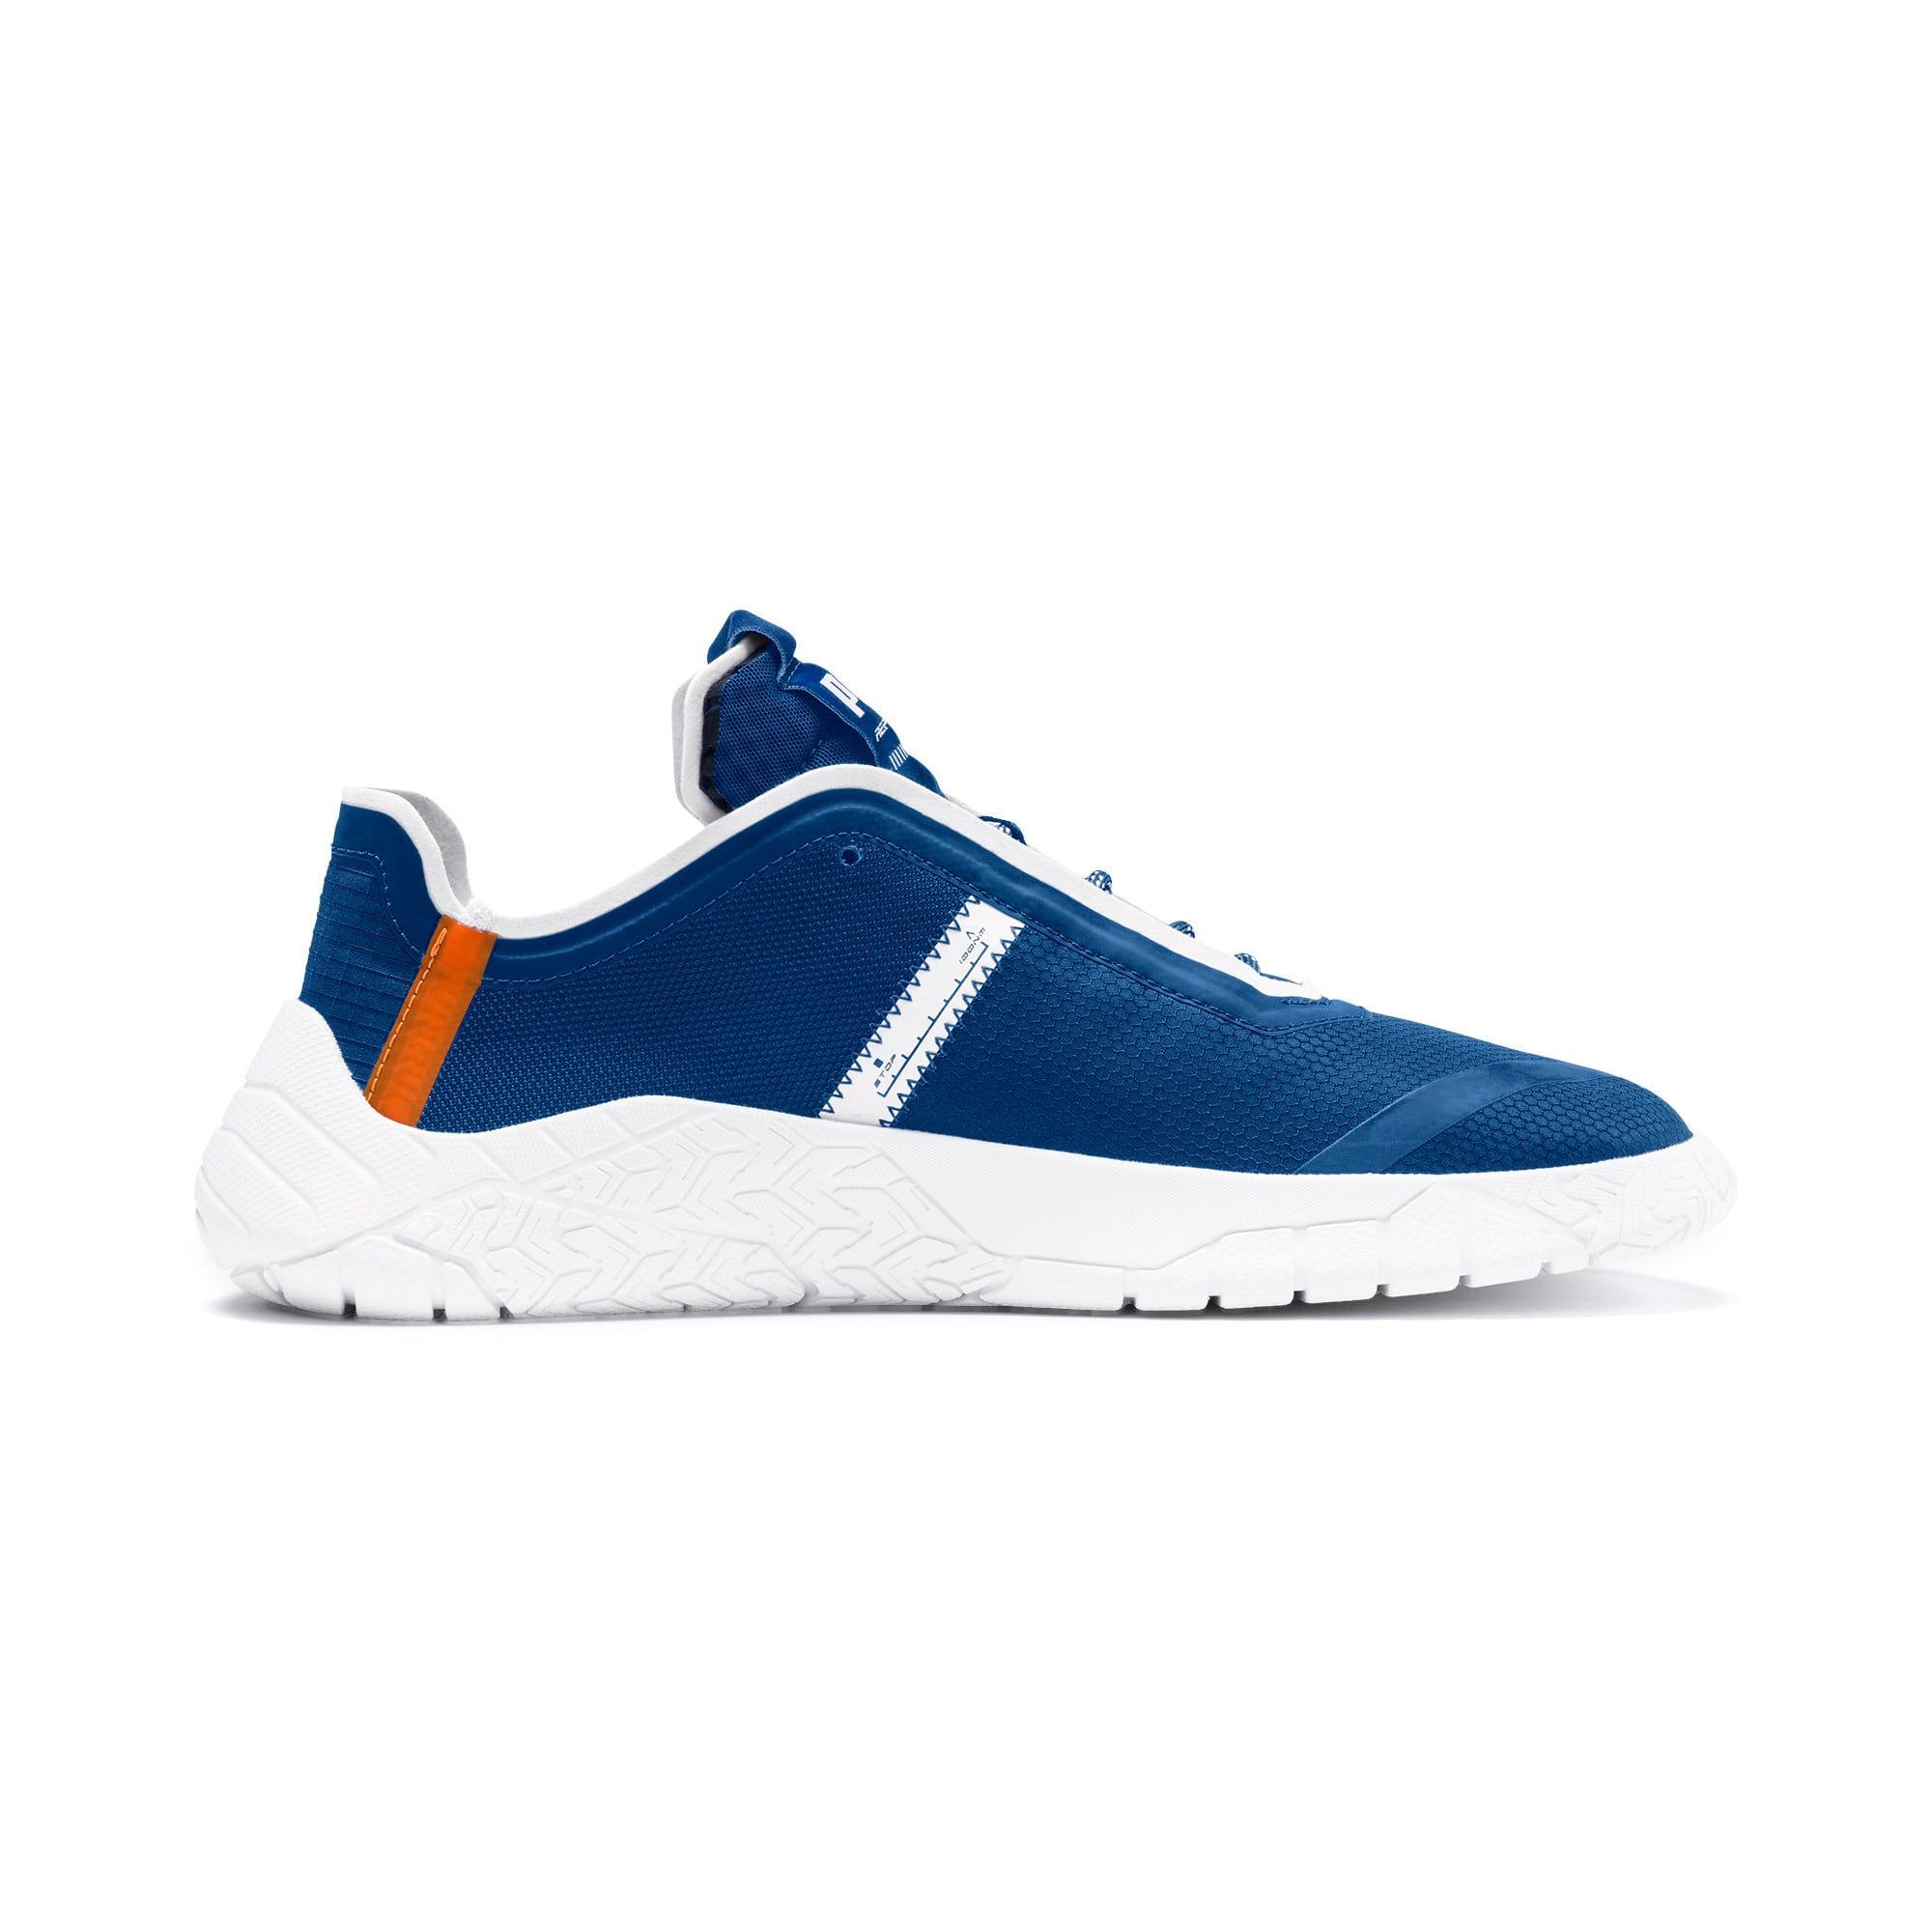 Thumbnail 5 of Replicat-X Circuit Motorsport Shoes, Galaxy Blue-Puma White, medium